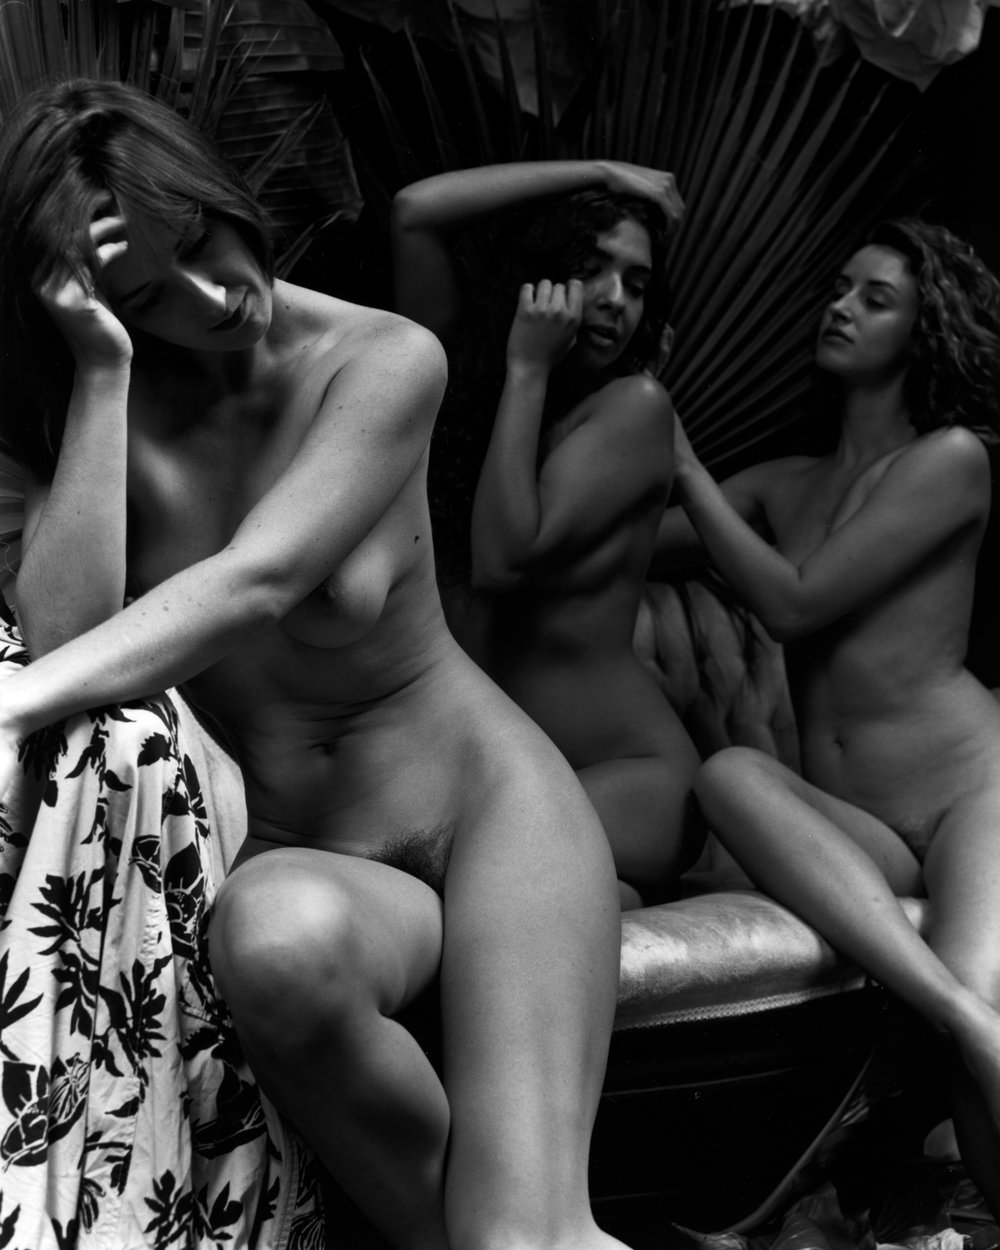 Nude Photograph by Kim Weston - Silver Gelatin Print Circa 2017